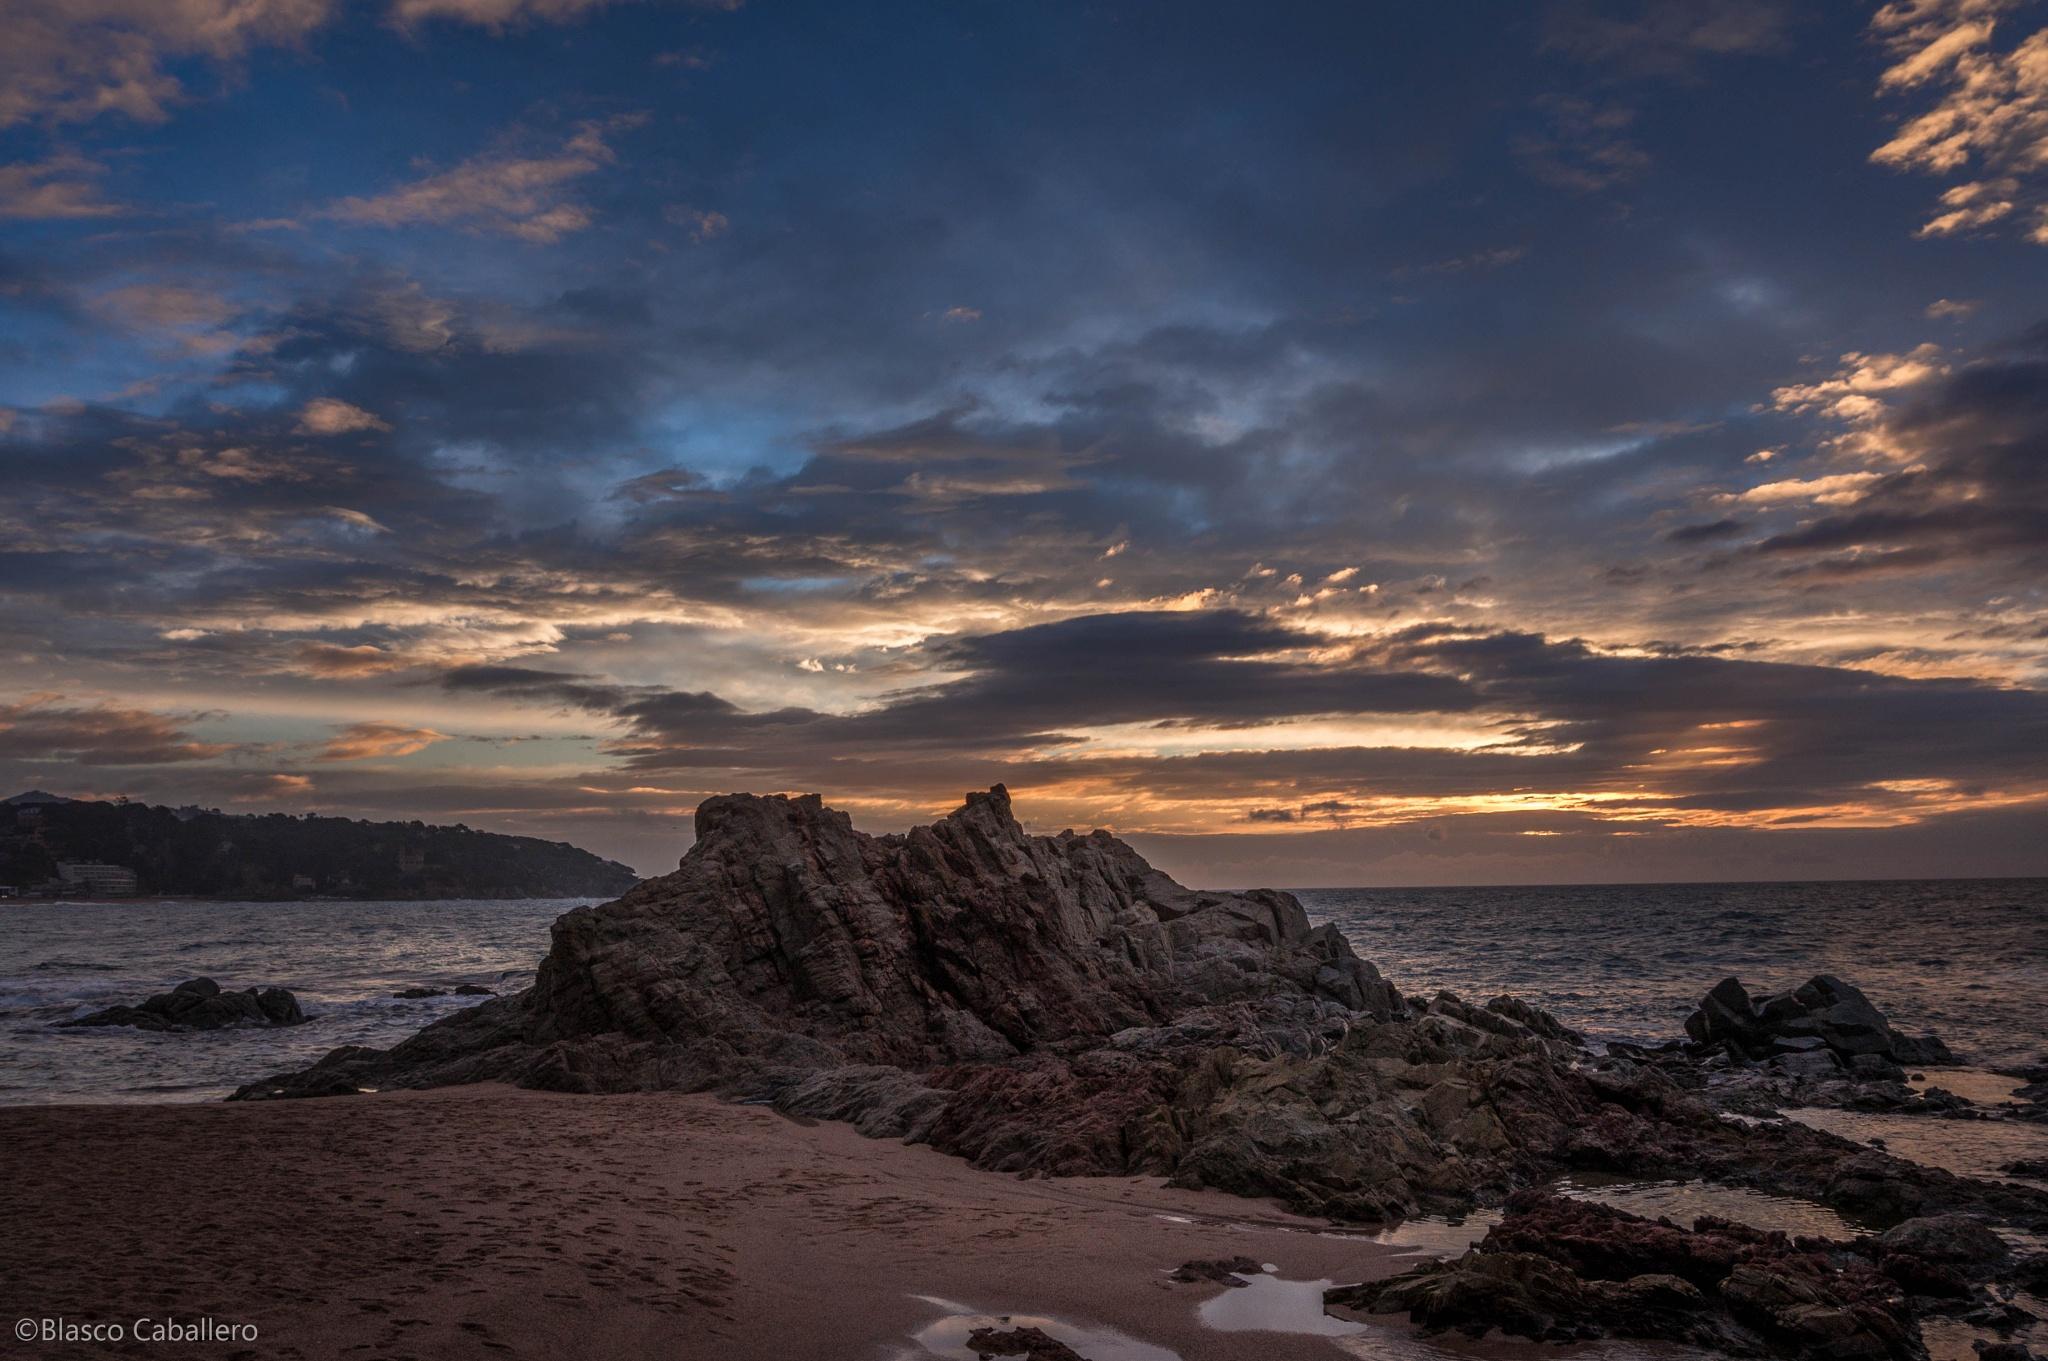 Sea & Rocks of Lloret by Blasco Caballero